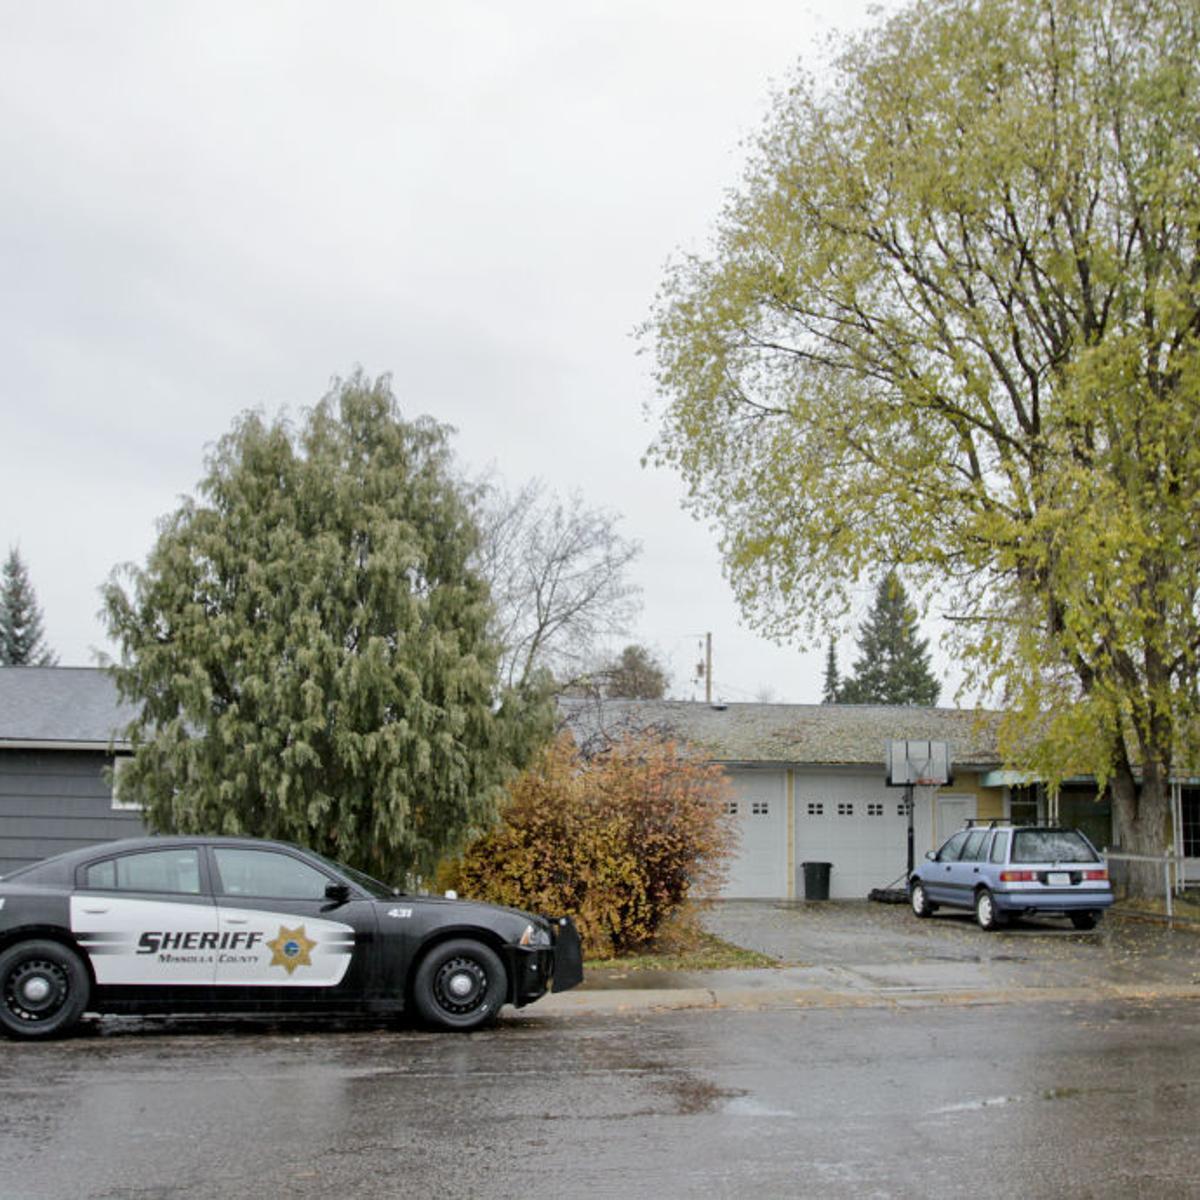 Suspects in Missoula burglary jailed in Idaho | Local